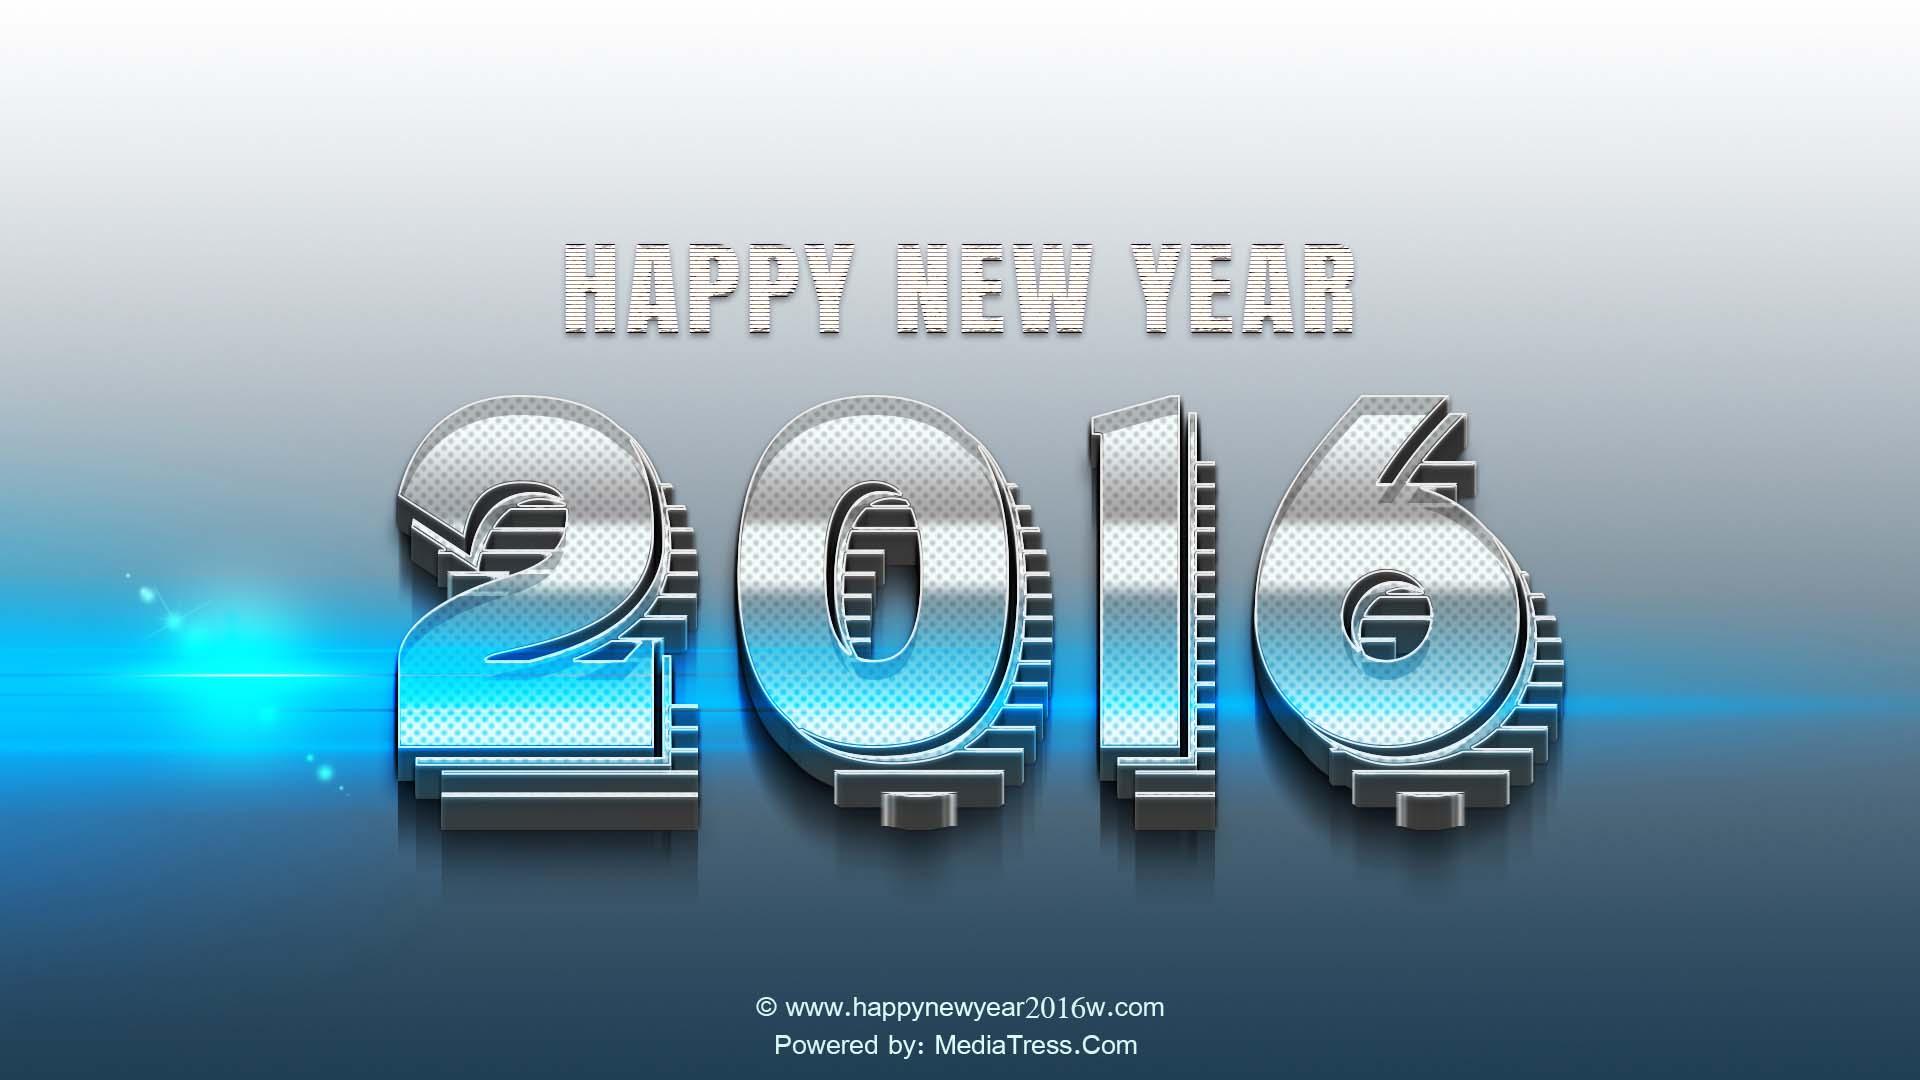 3D Wallpapers Written On It Happy New Year 2016 1920x1080